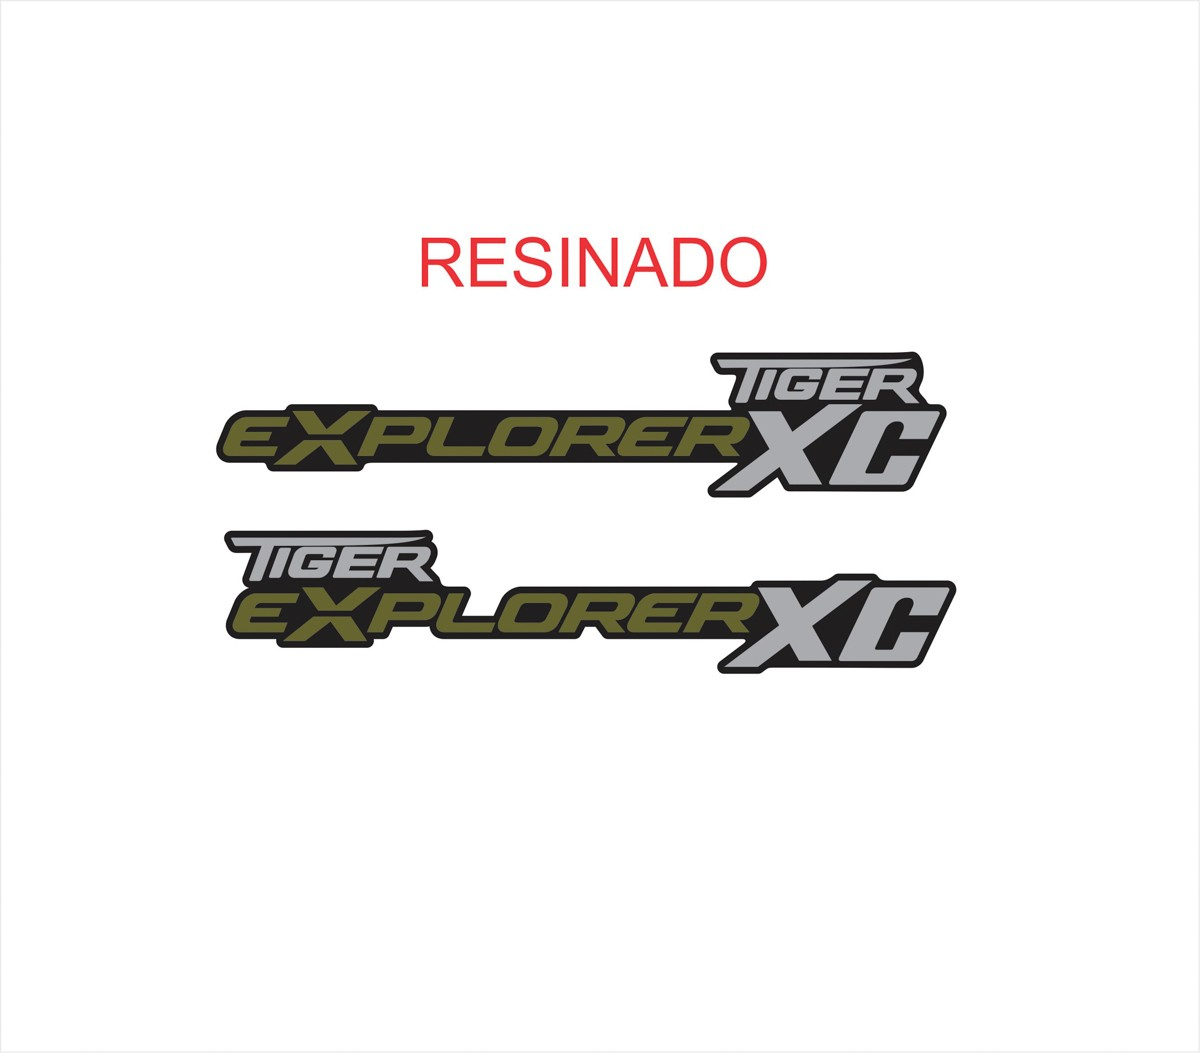 Par Adesivo Triumph Tiger Explorer Xc Resinado Tg032